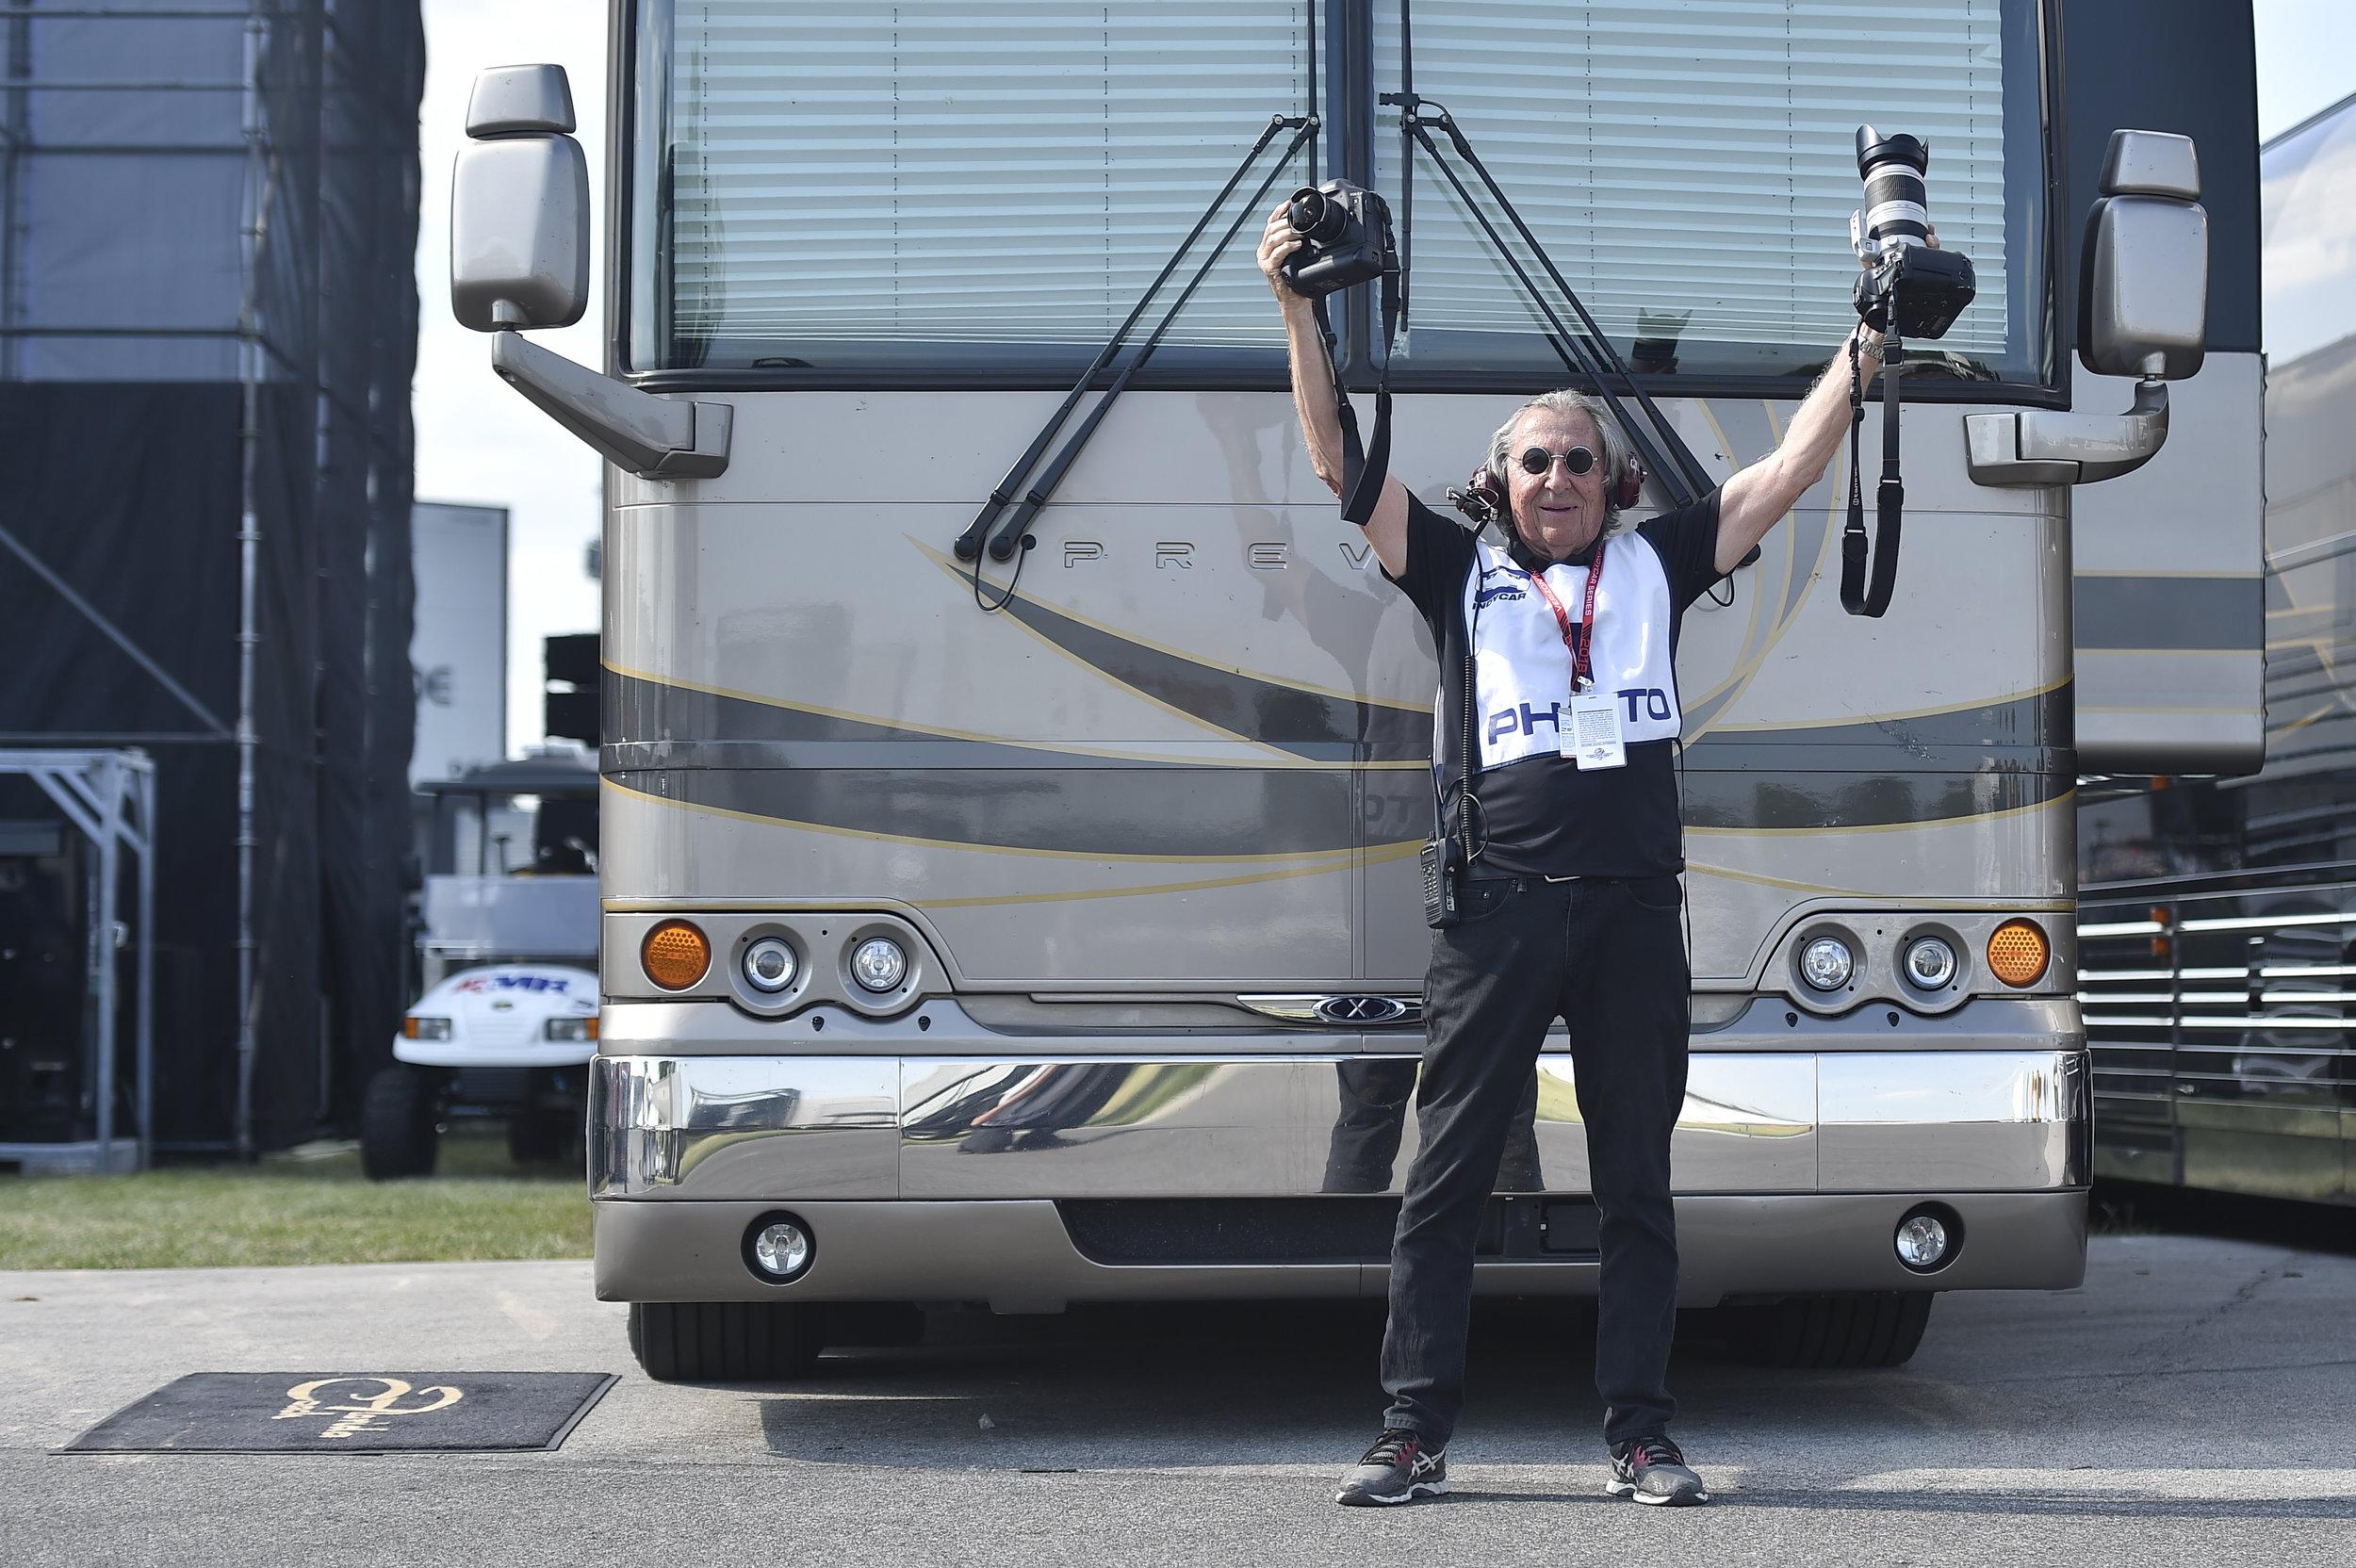 """Slick"" on Tour - Shot with Nikon D4S - Indianapolis Motor Speedway"